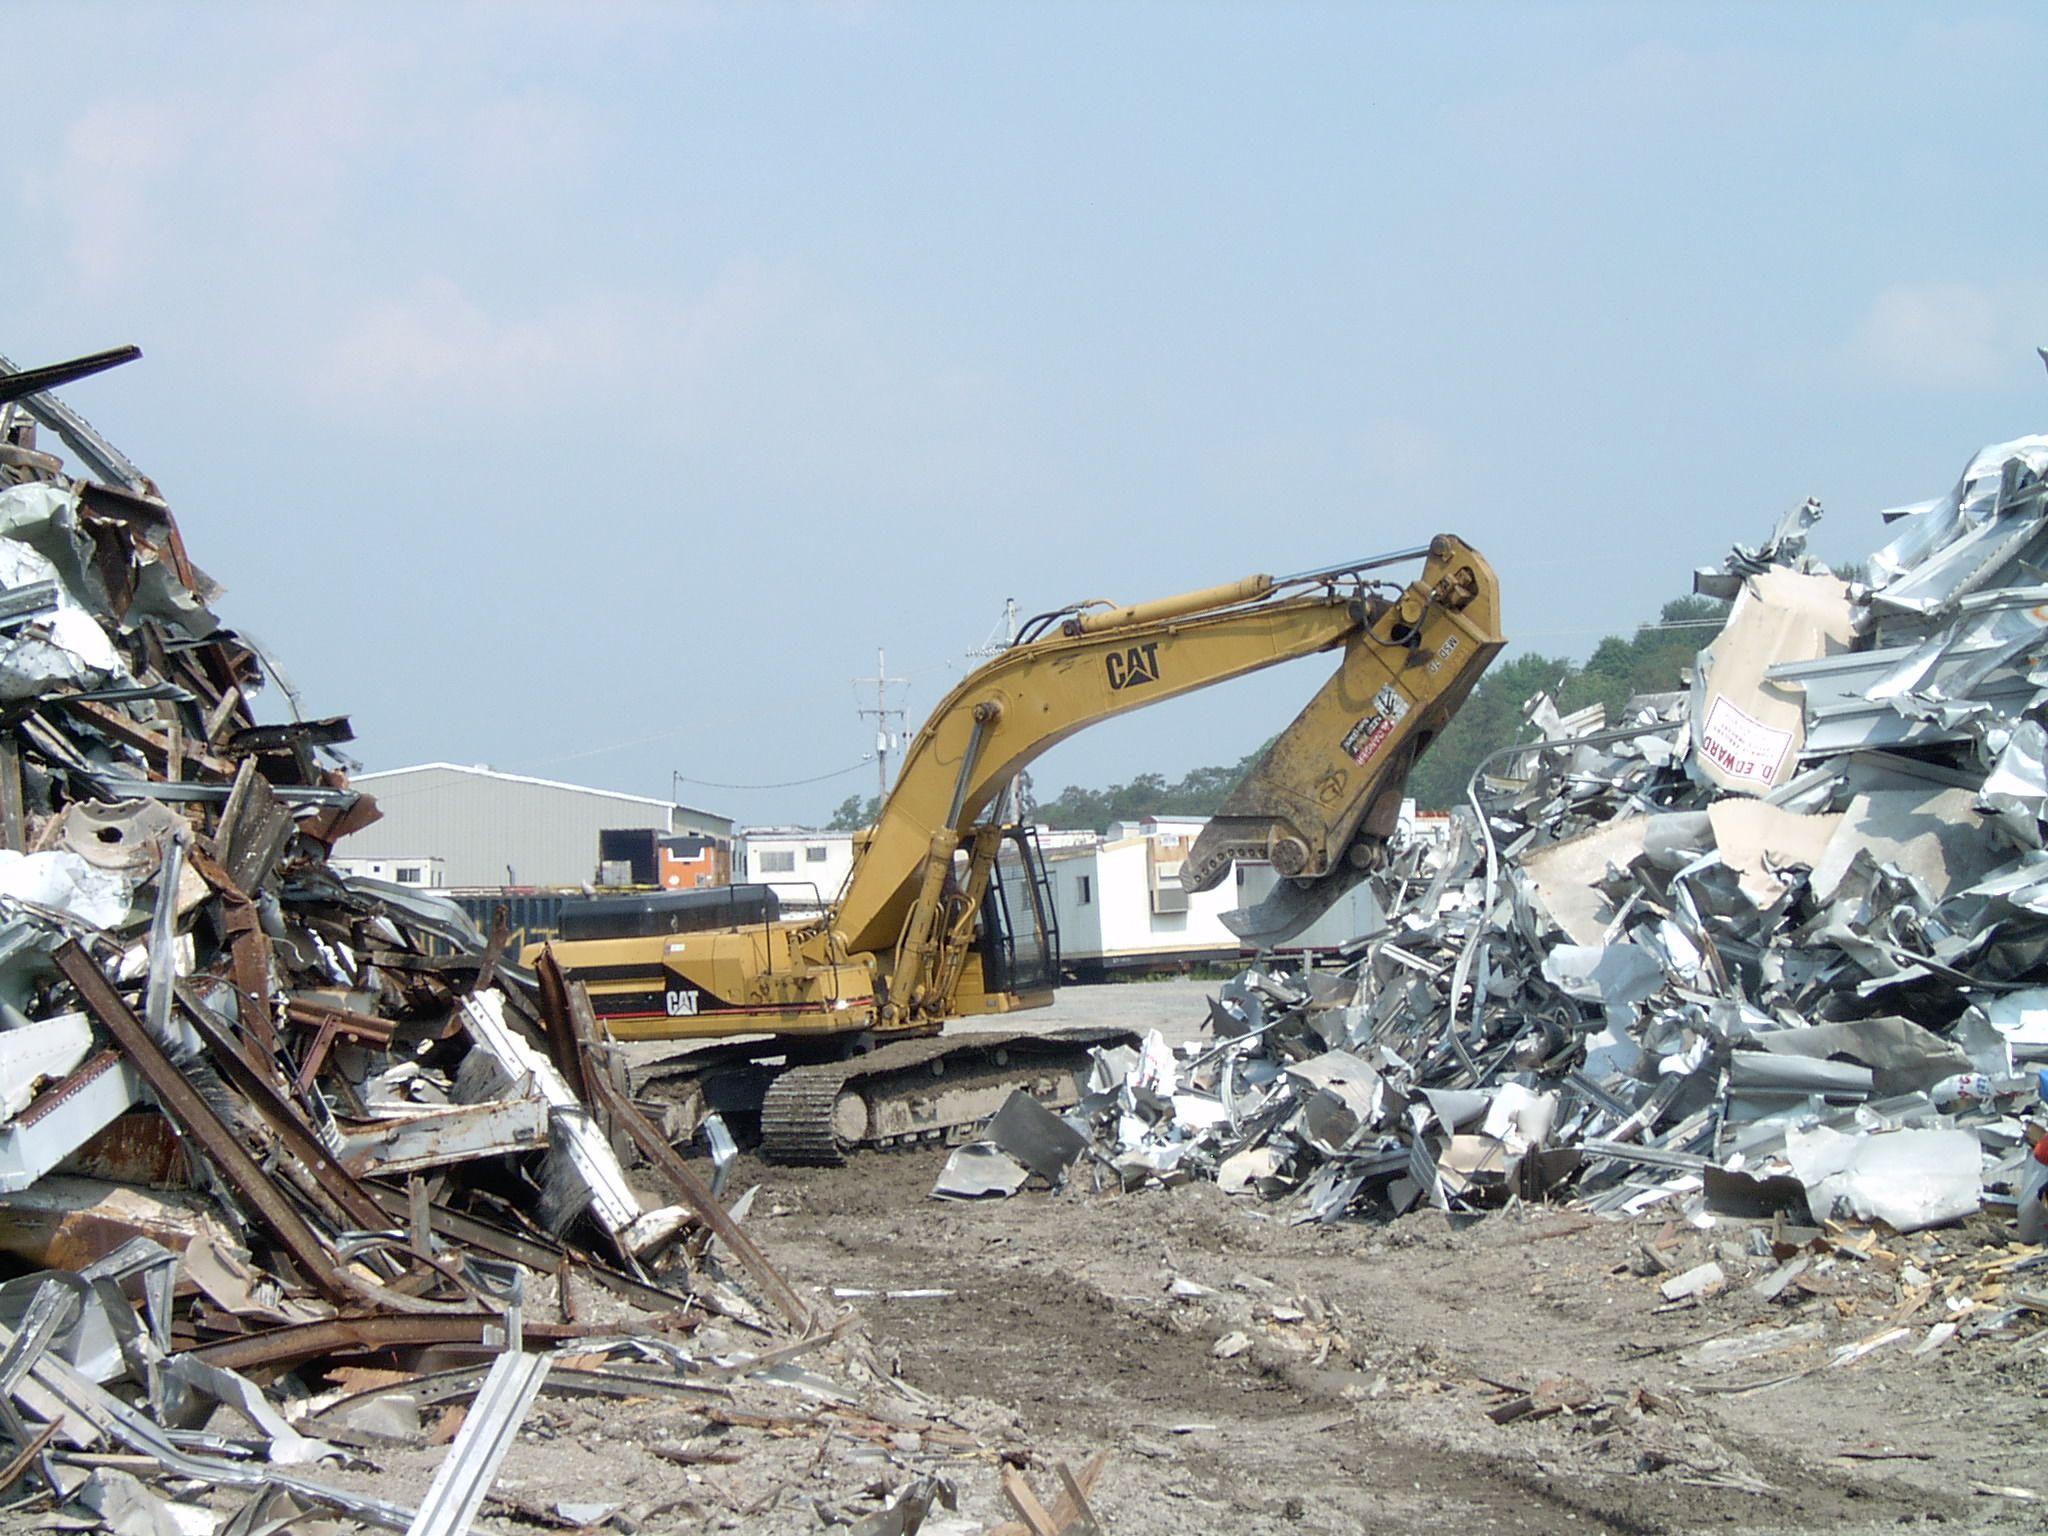 Get Current Scrap Metal Prices in the U.S.